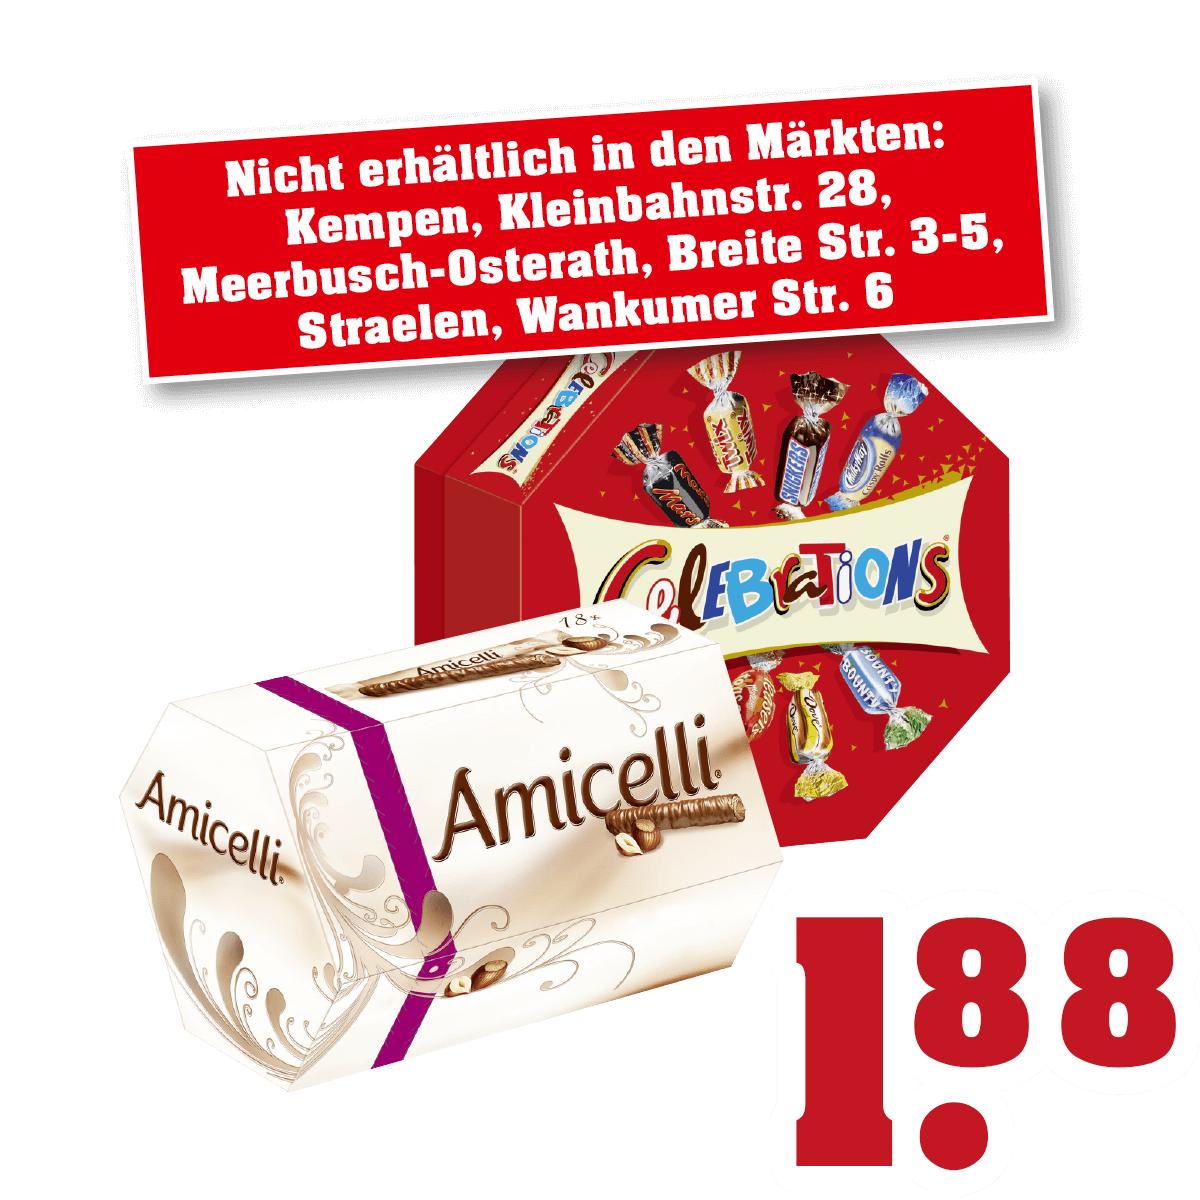 [Offline / Trinkgut] Amicelli / Celebrations für 1,88 €